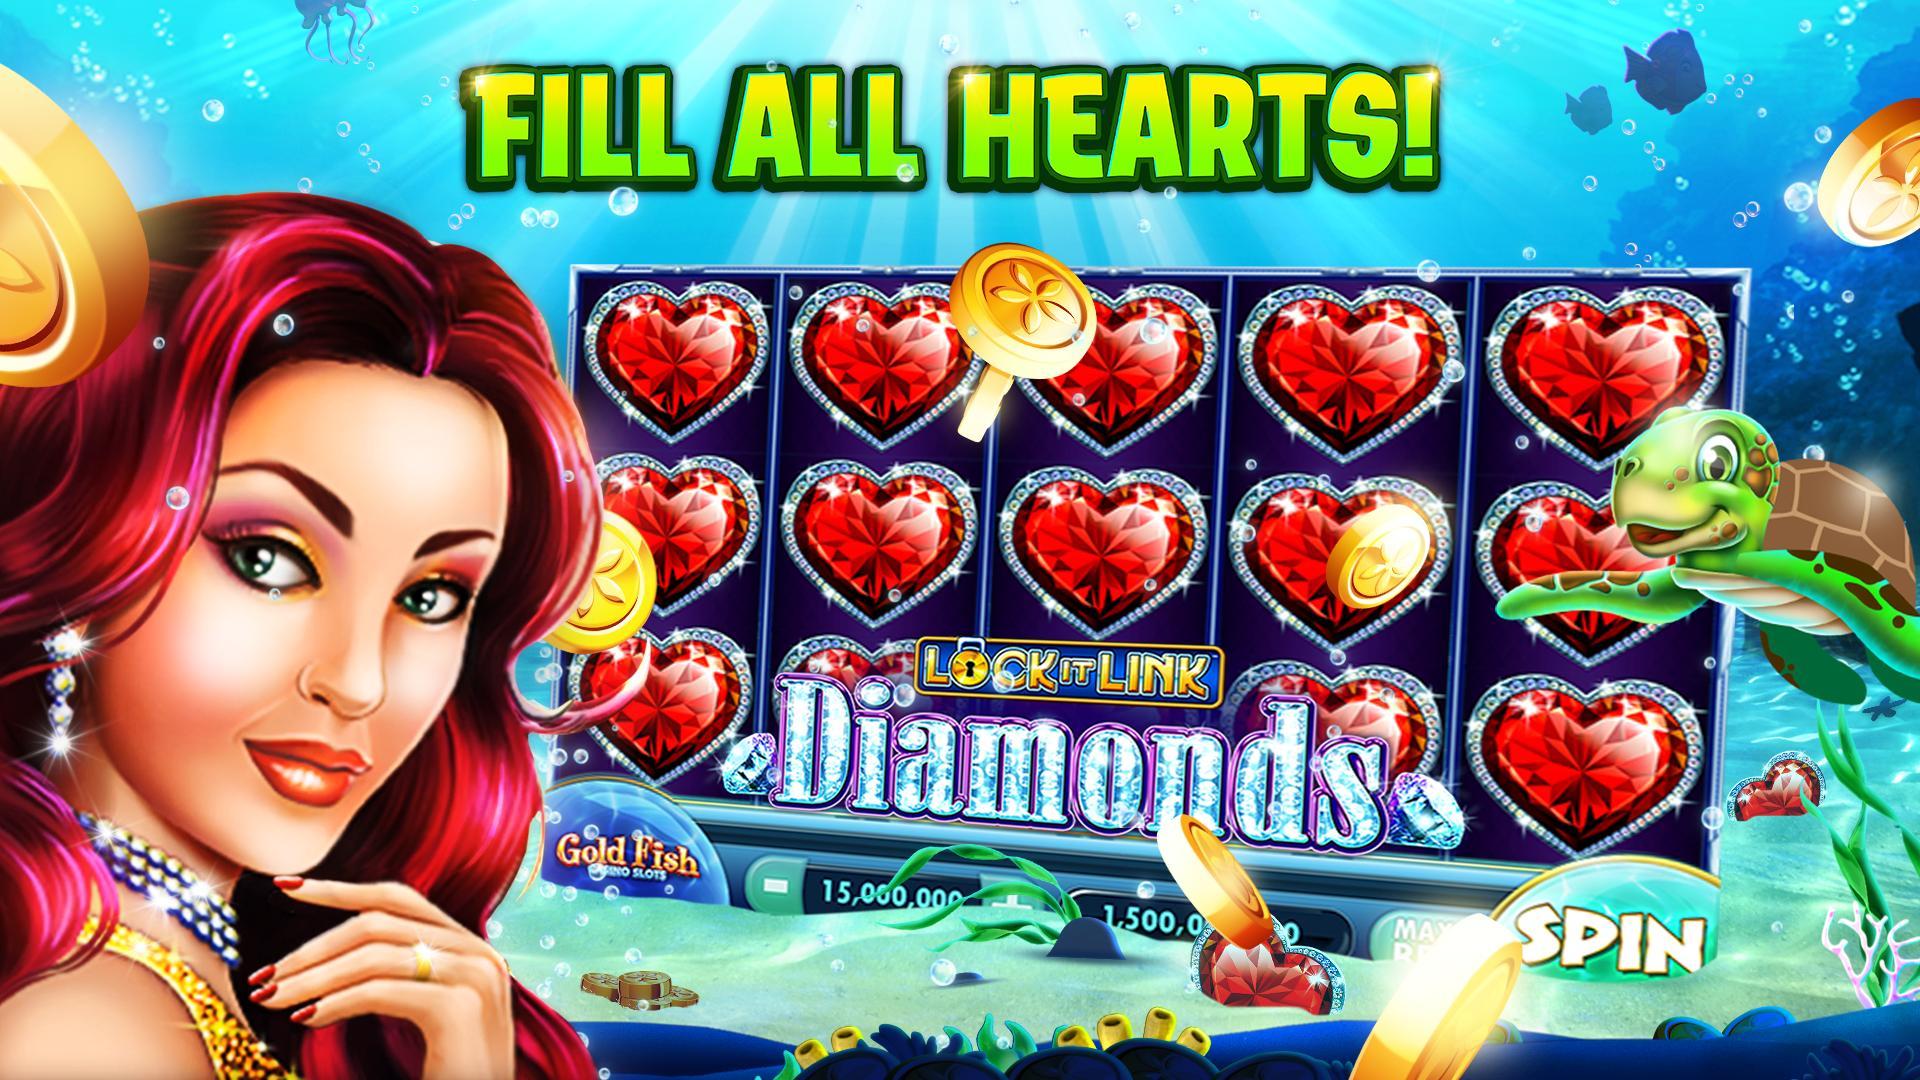 Gold Fish Casino Slots - FREE Slot Machine Games 25.09.00 Screenshot 24